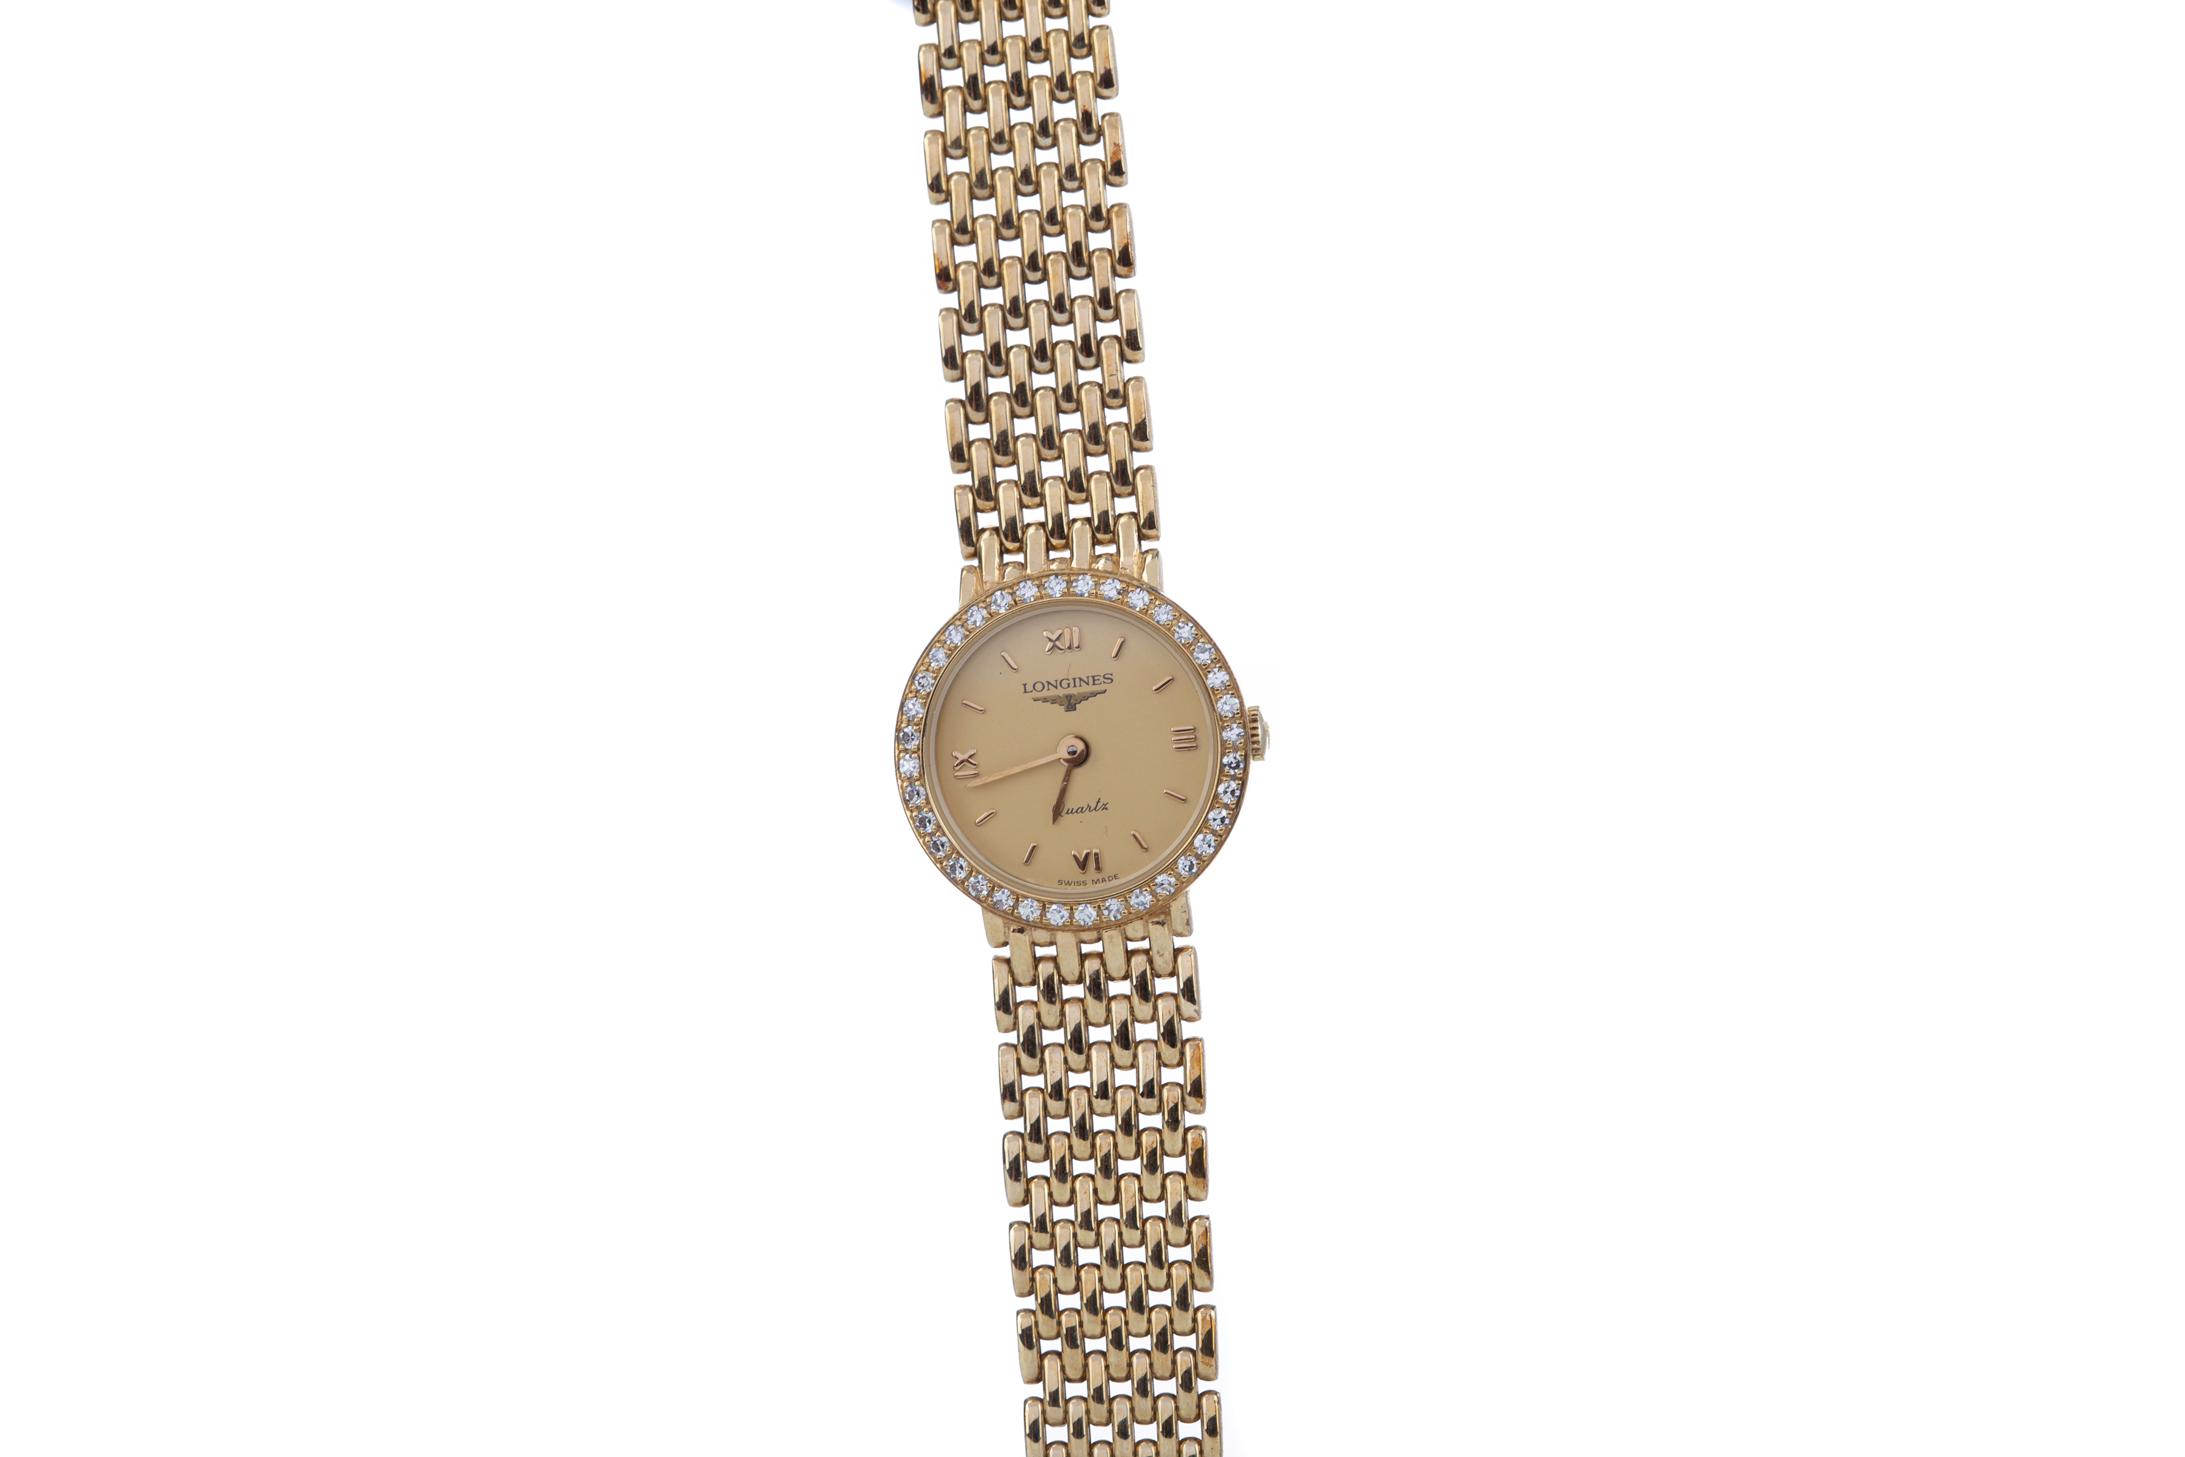 LADY'S LONGINES DIAMOND SET NINE CARAT GOLD QUARTZ WRIST WATCH, the round gold coloured dial with